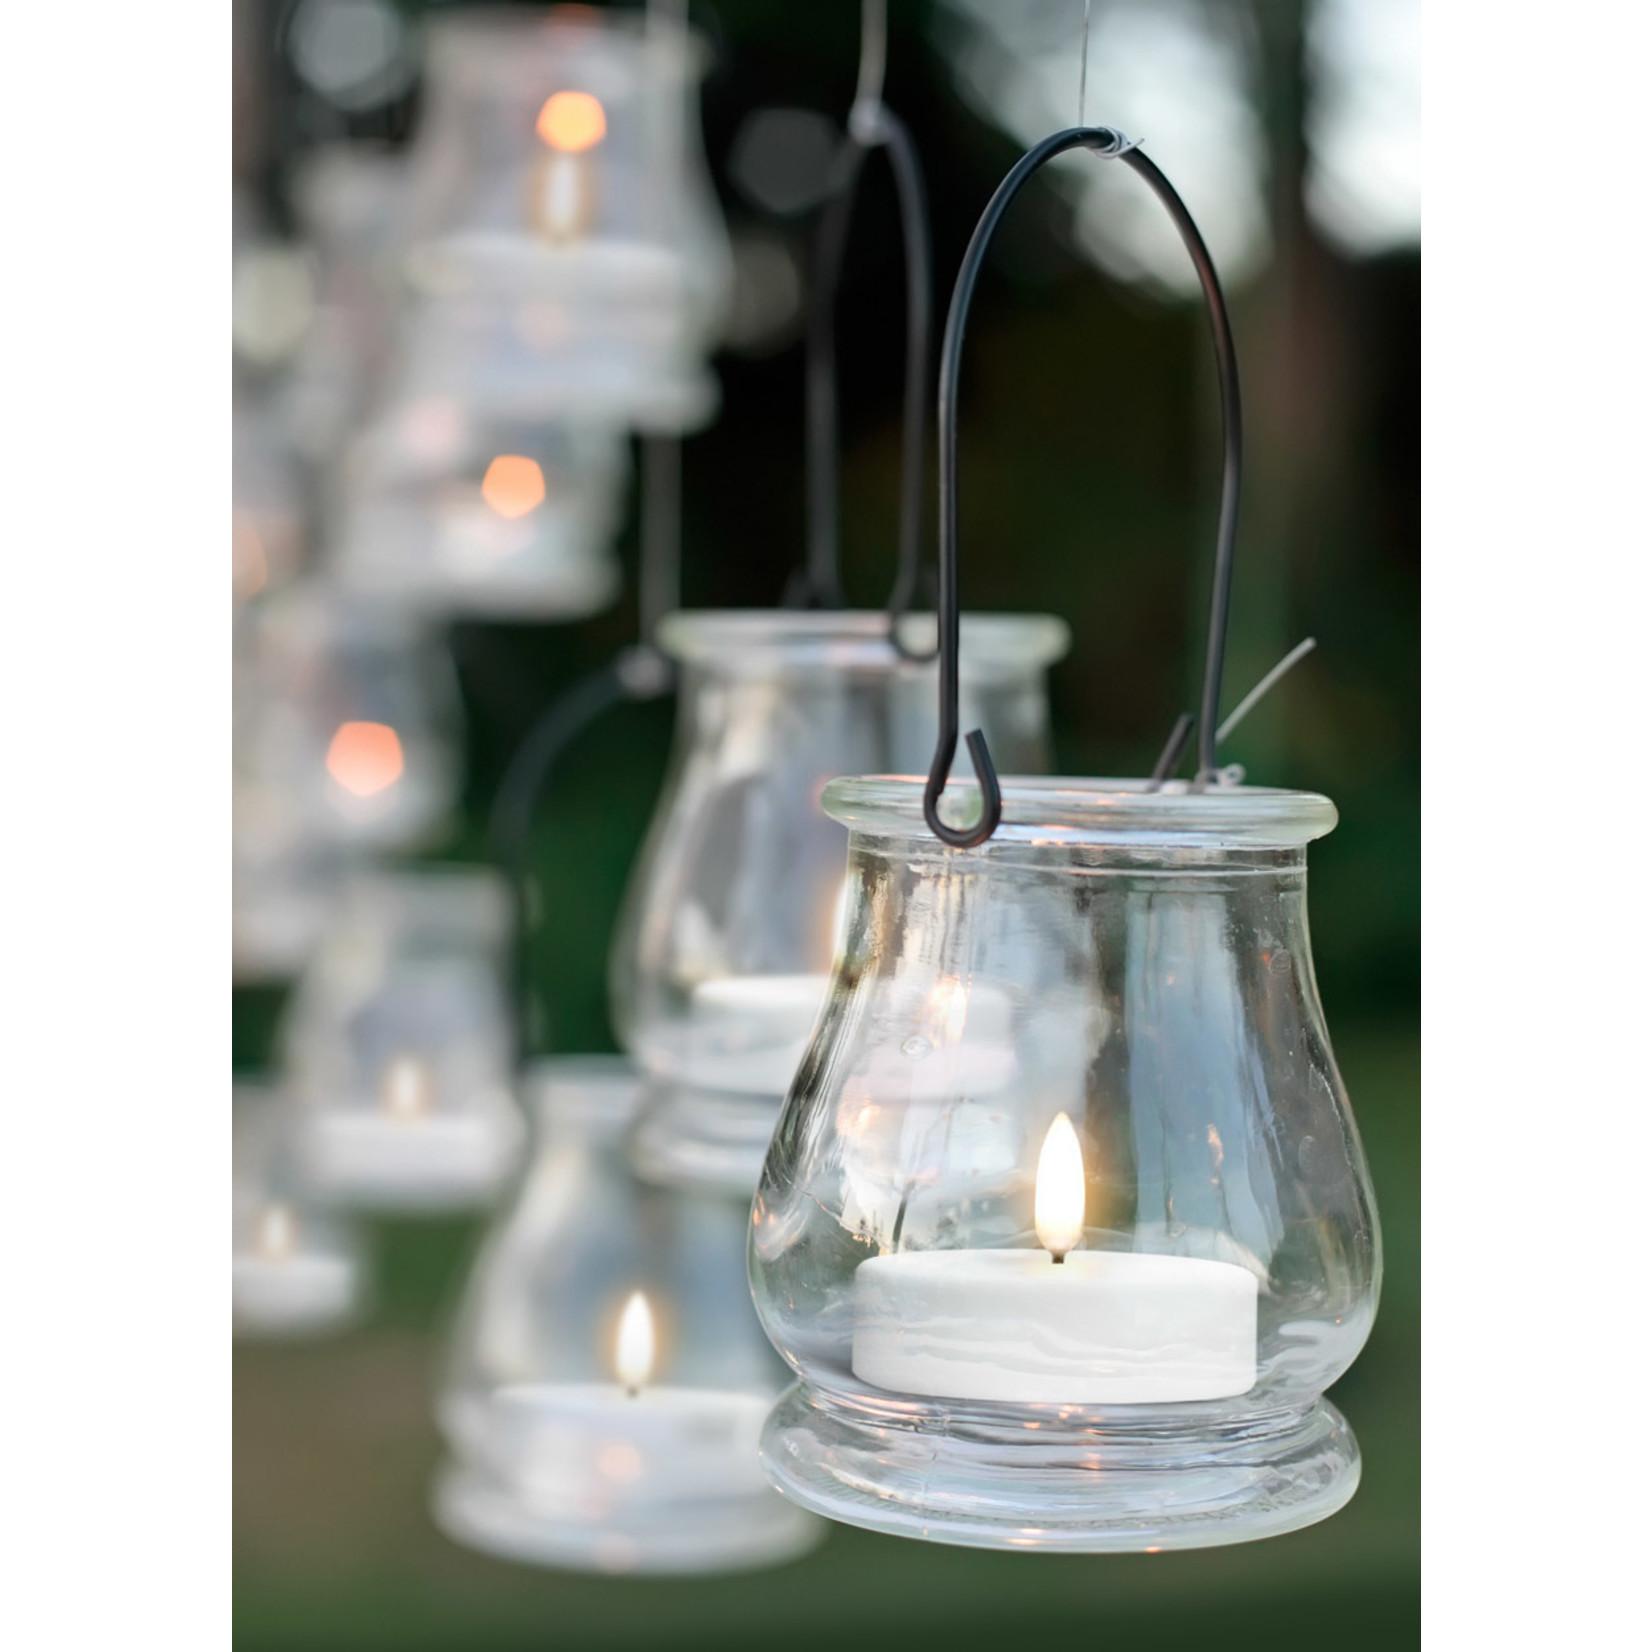 UYUNI LIGHTING LED MAXI TEA-LIGHT - NORDIC WHITE - Ø6,1 x 2,2 CM